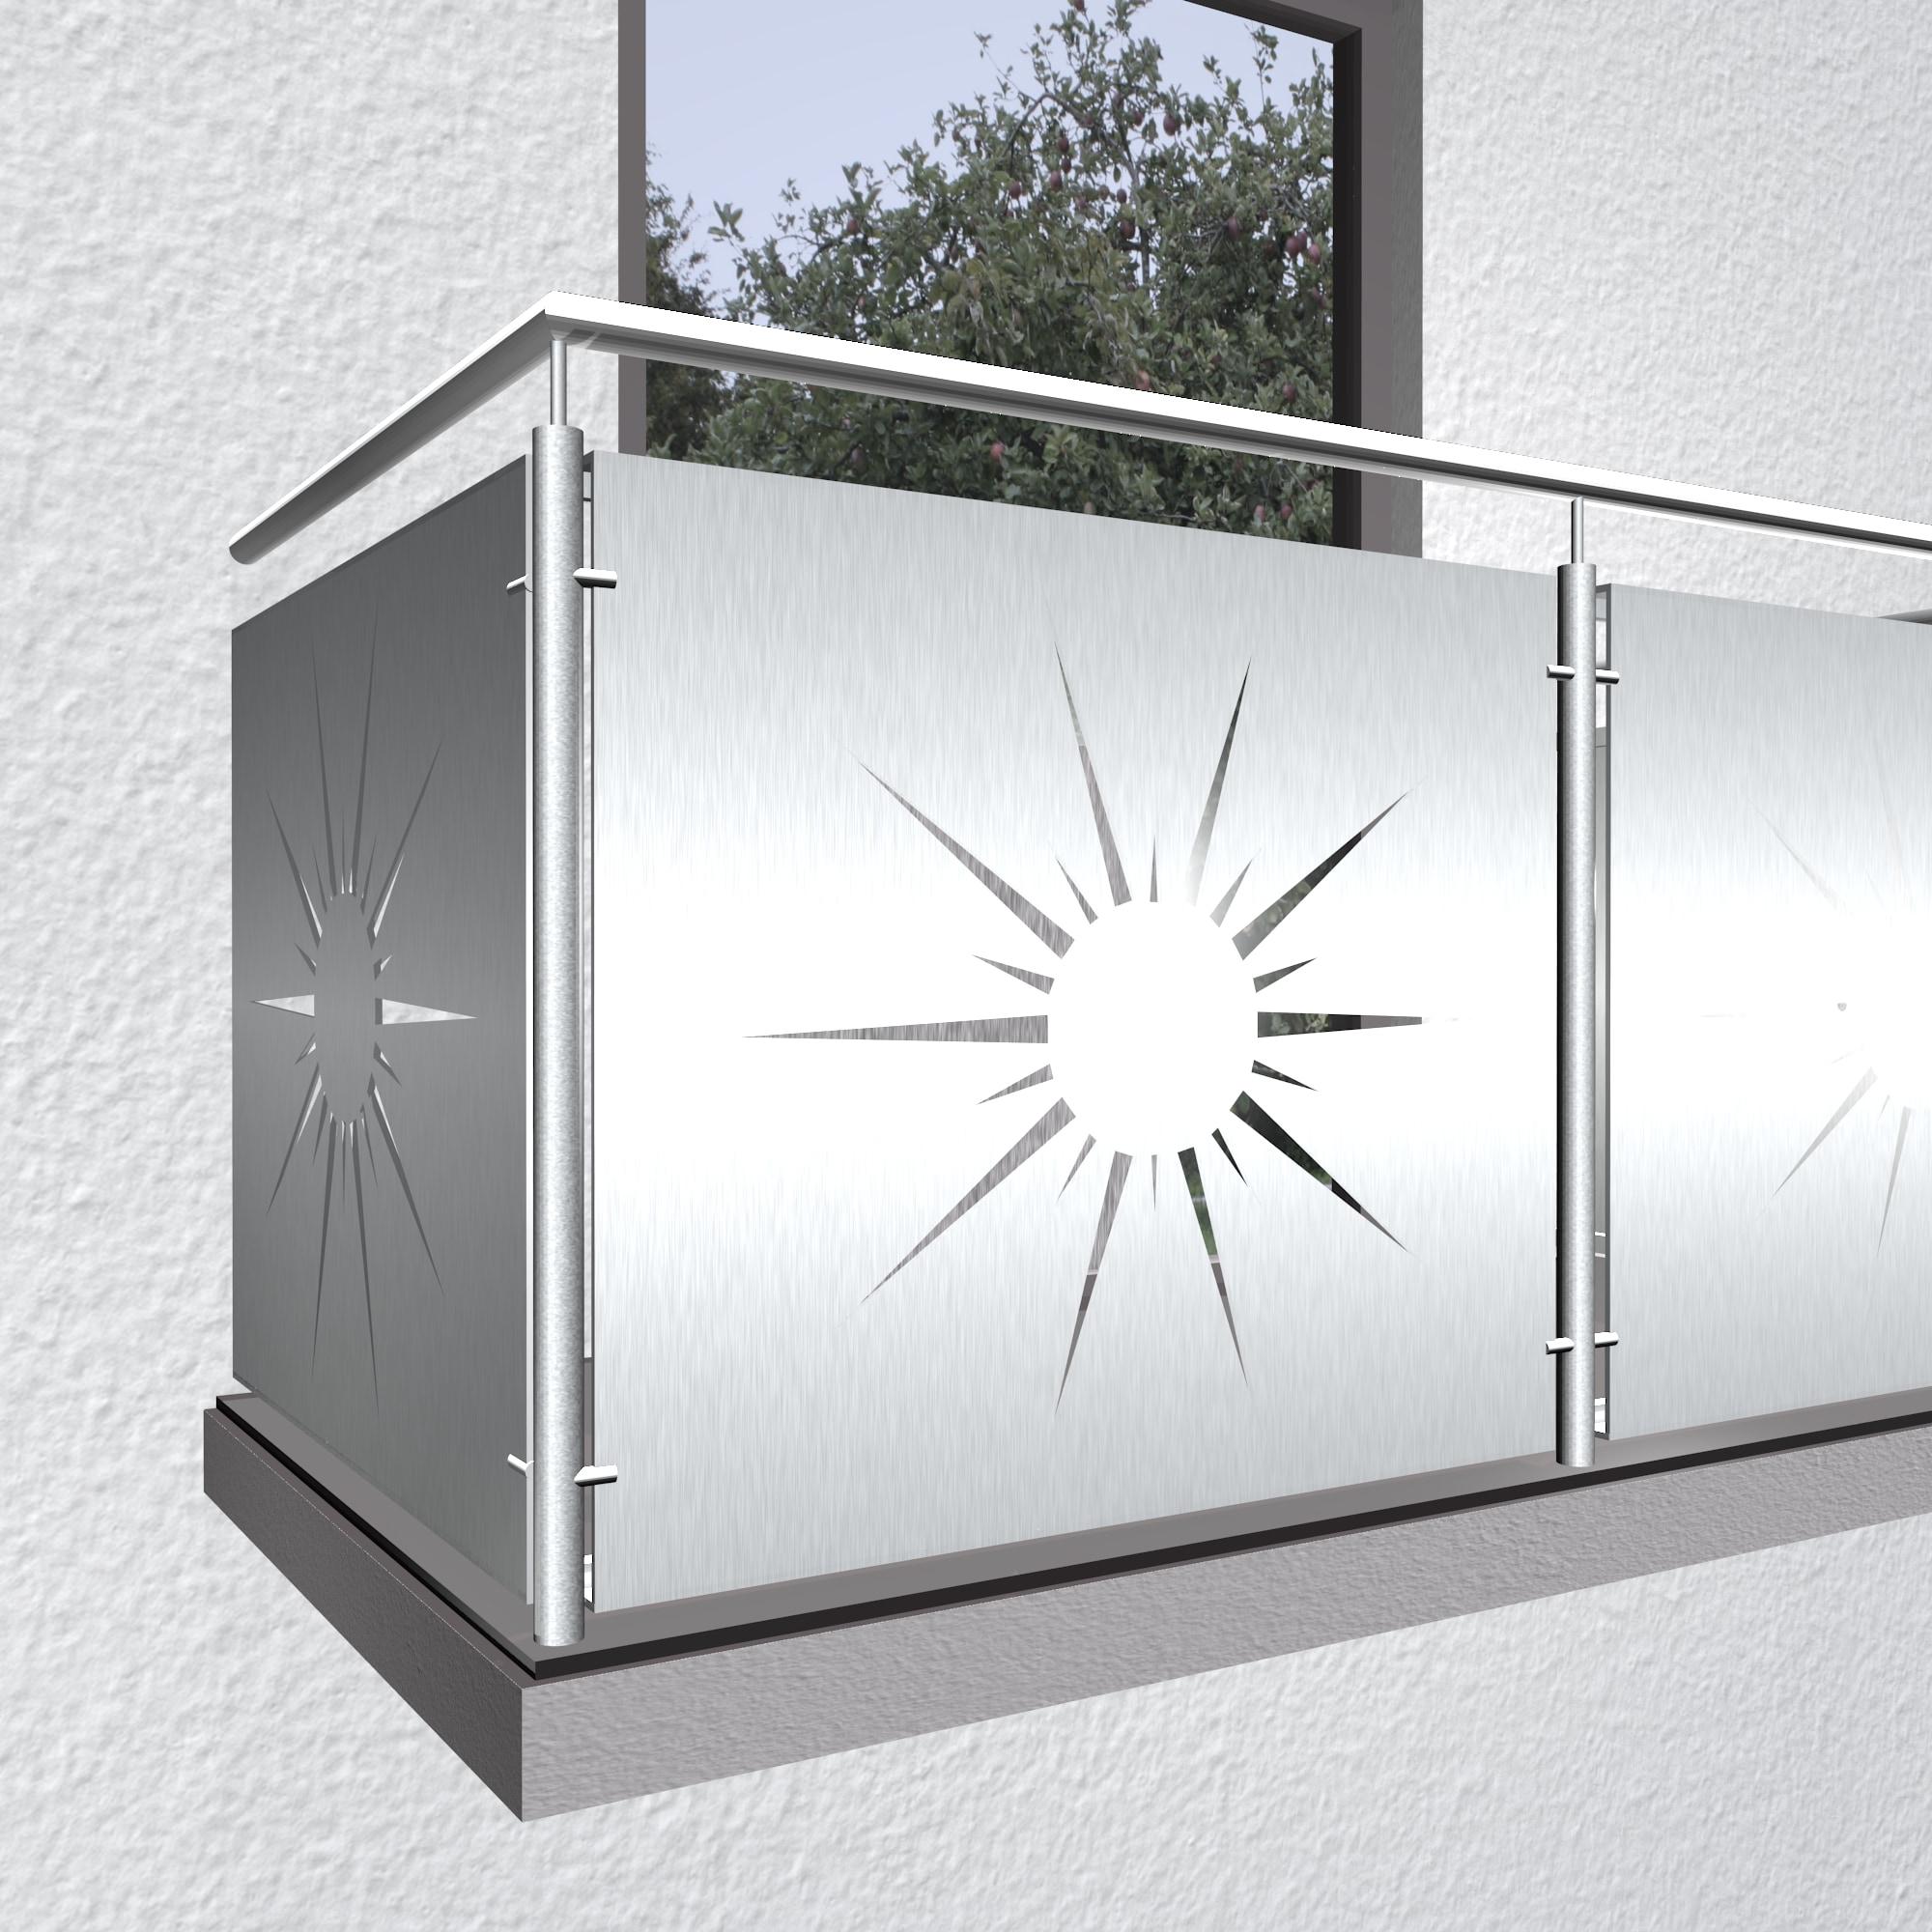 Balkonverkleidung Aluminium SO